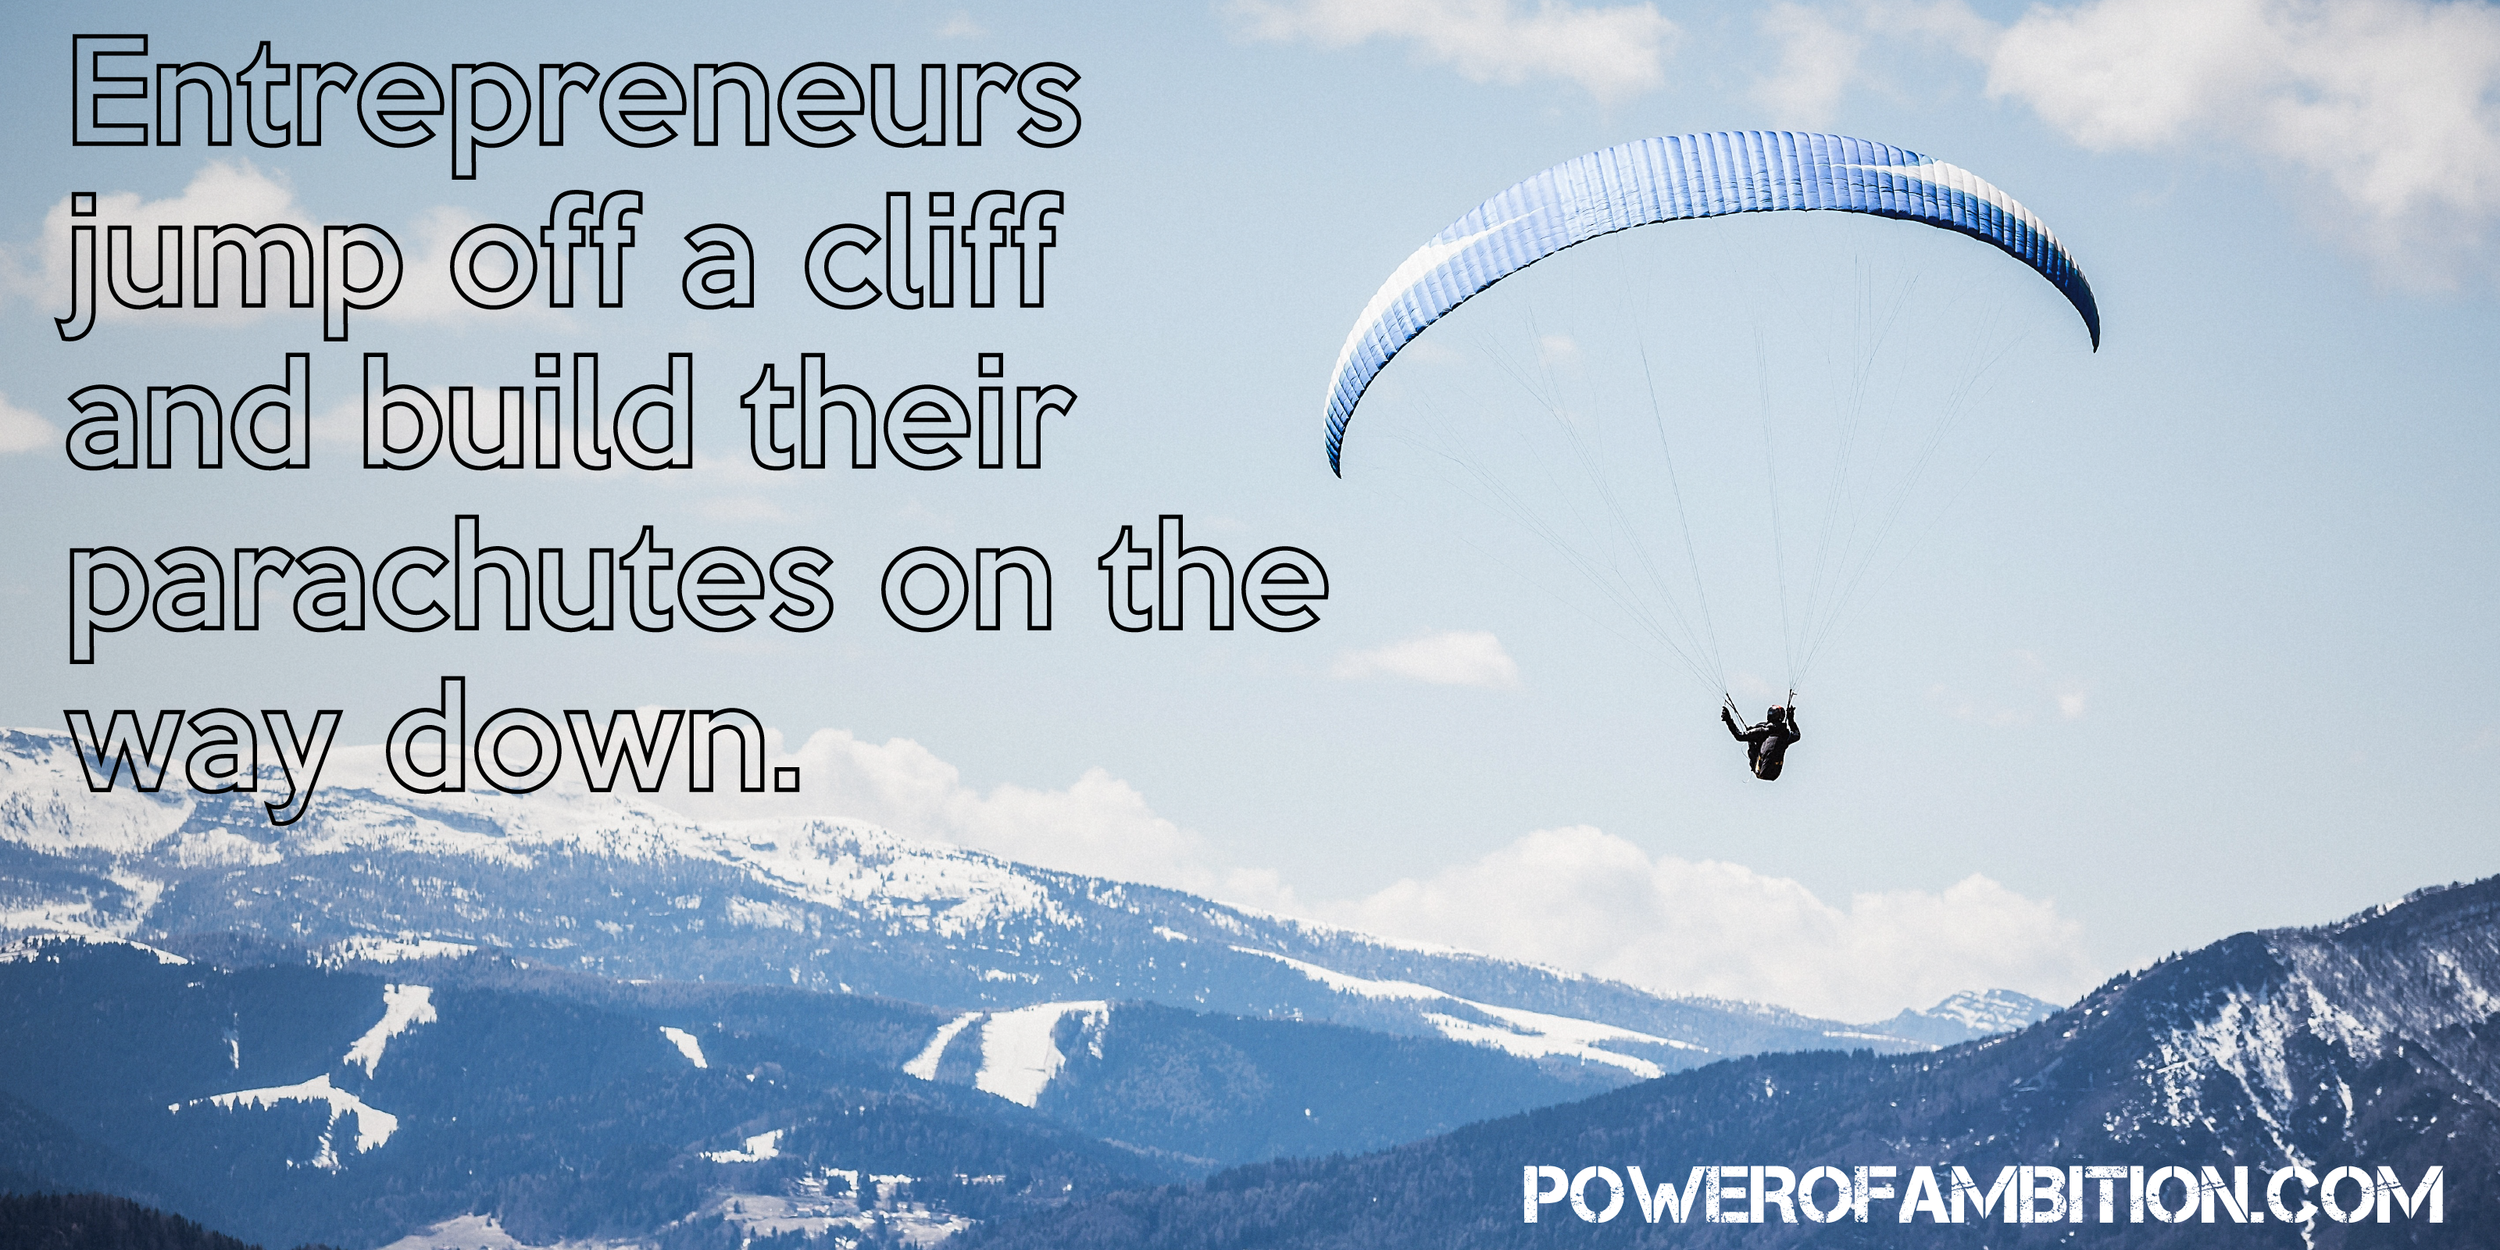 entrepreneurs_build_a_parachute_on_the_way_down